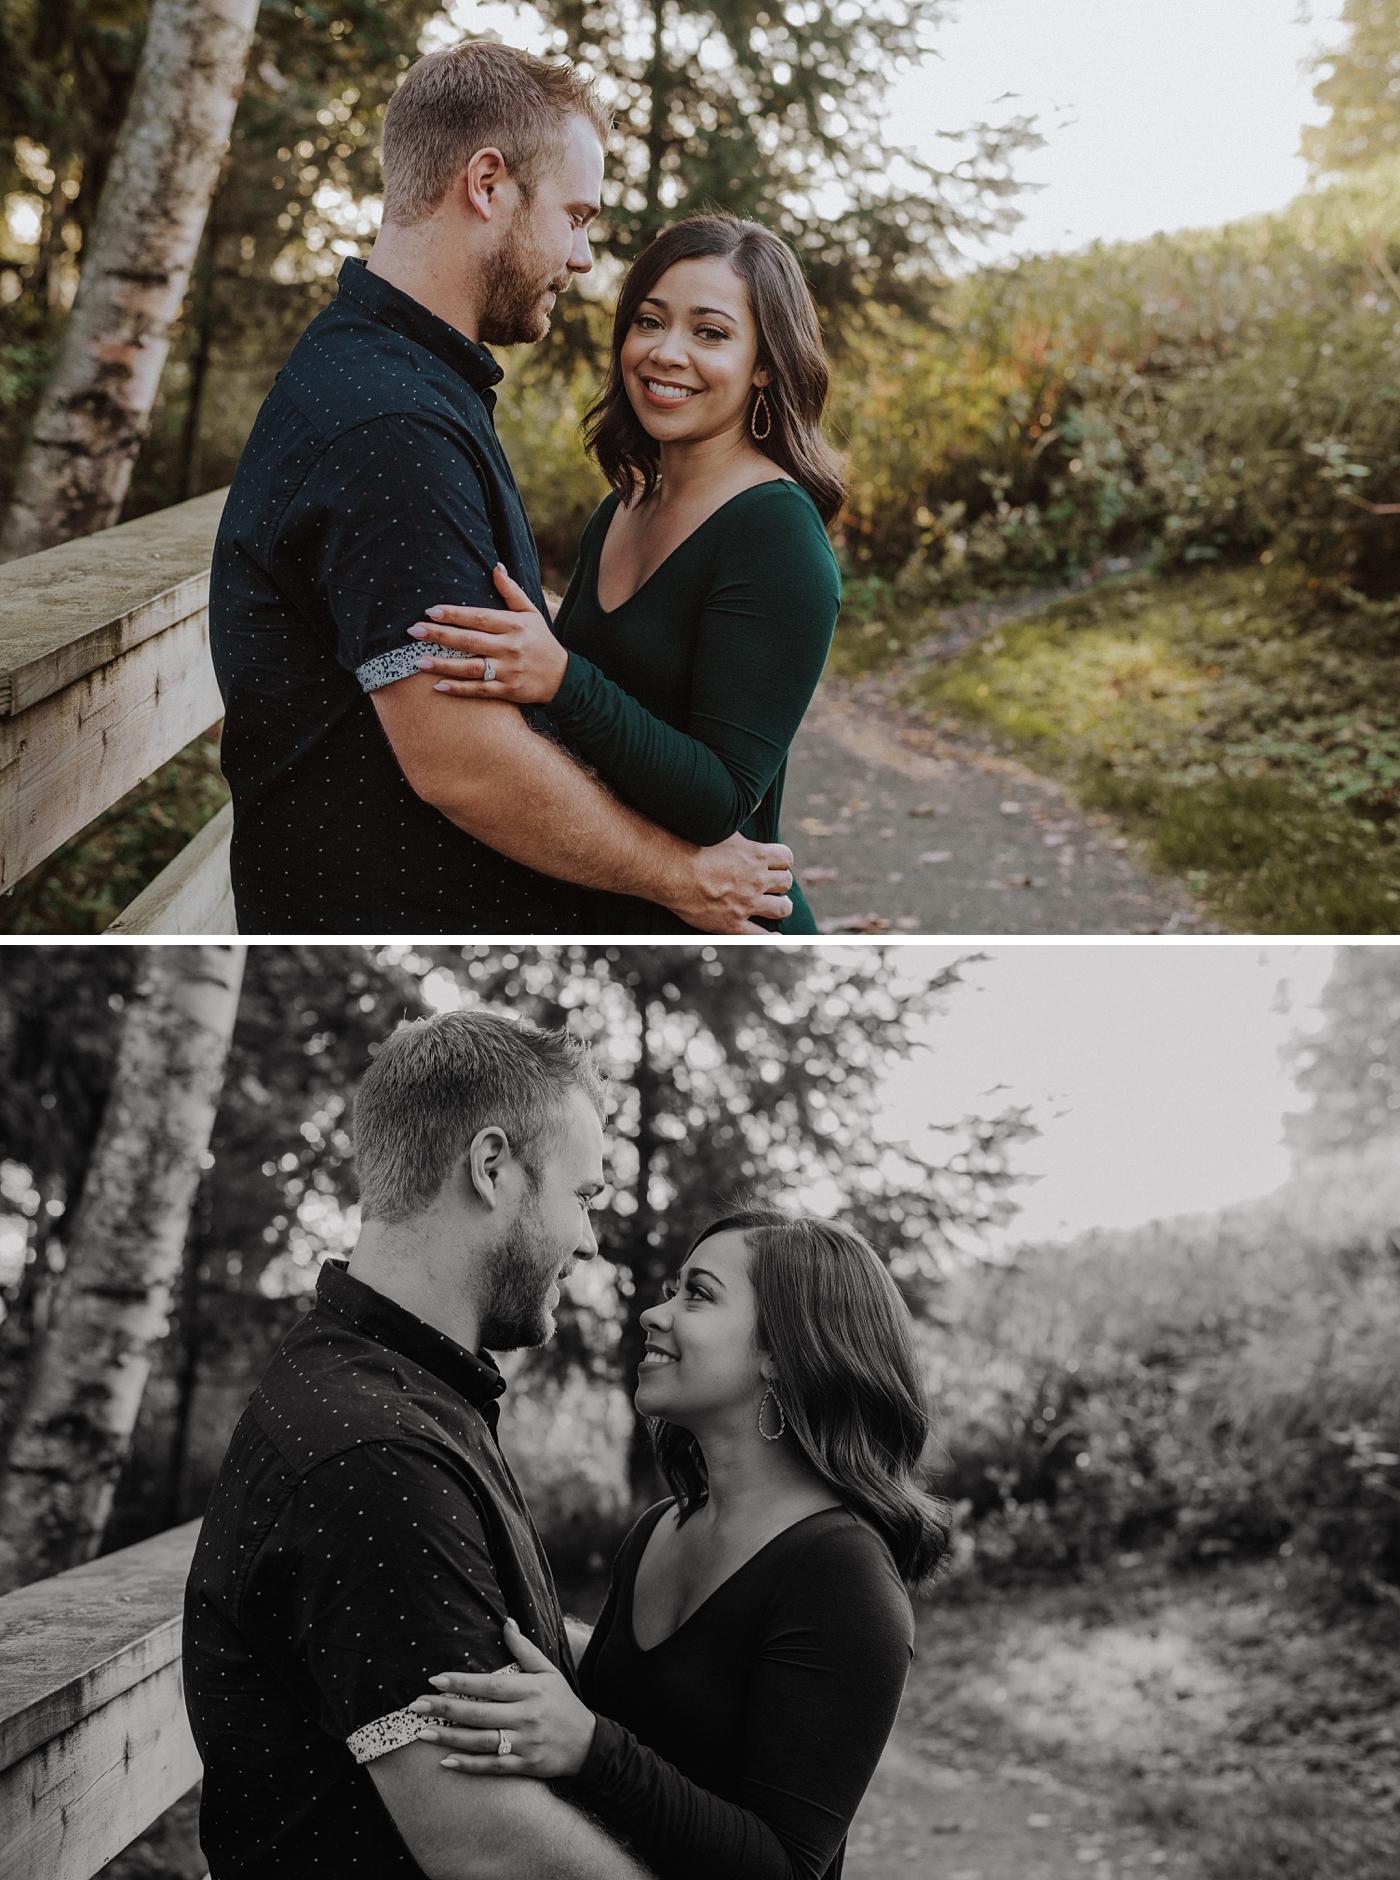 Romantic-Greenery-Engagement-Photography_0005.jpg